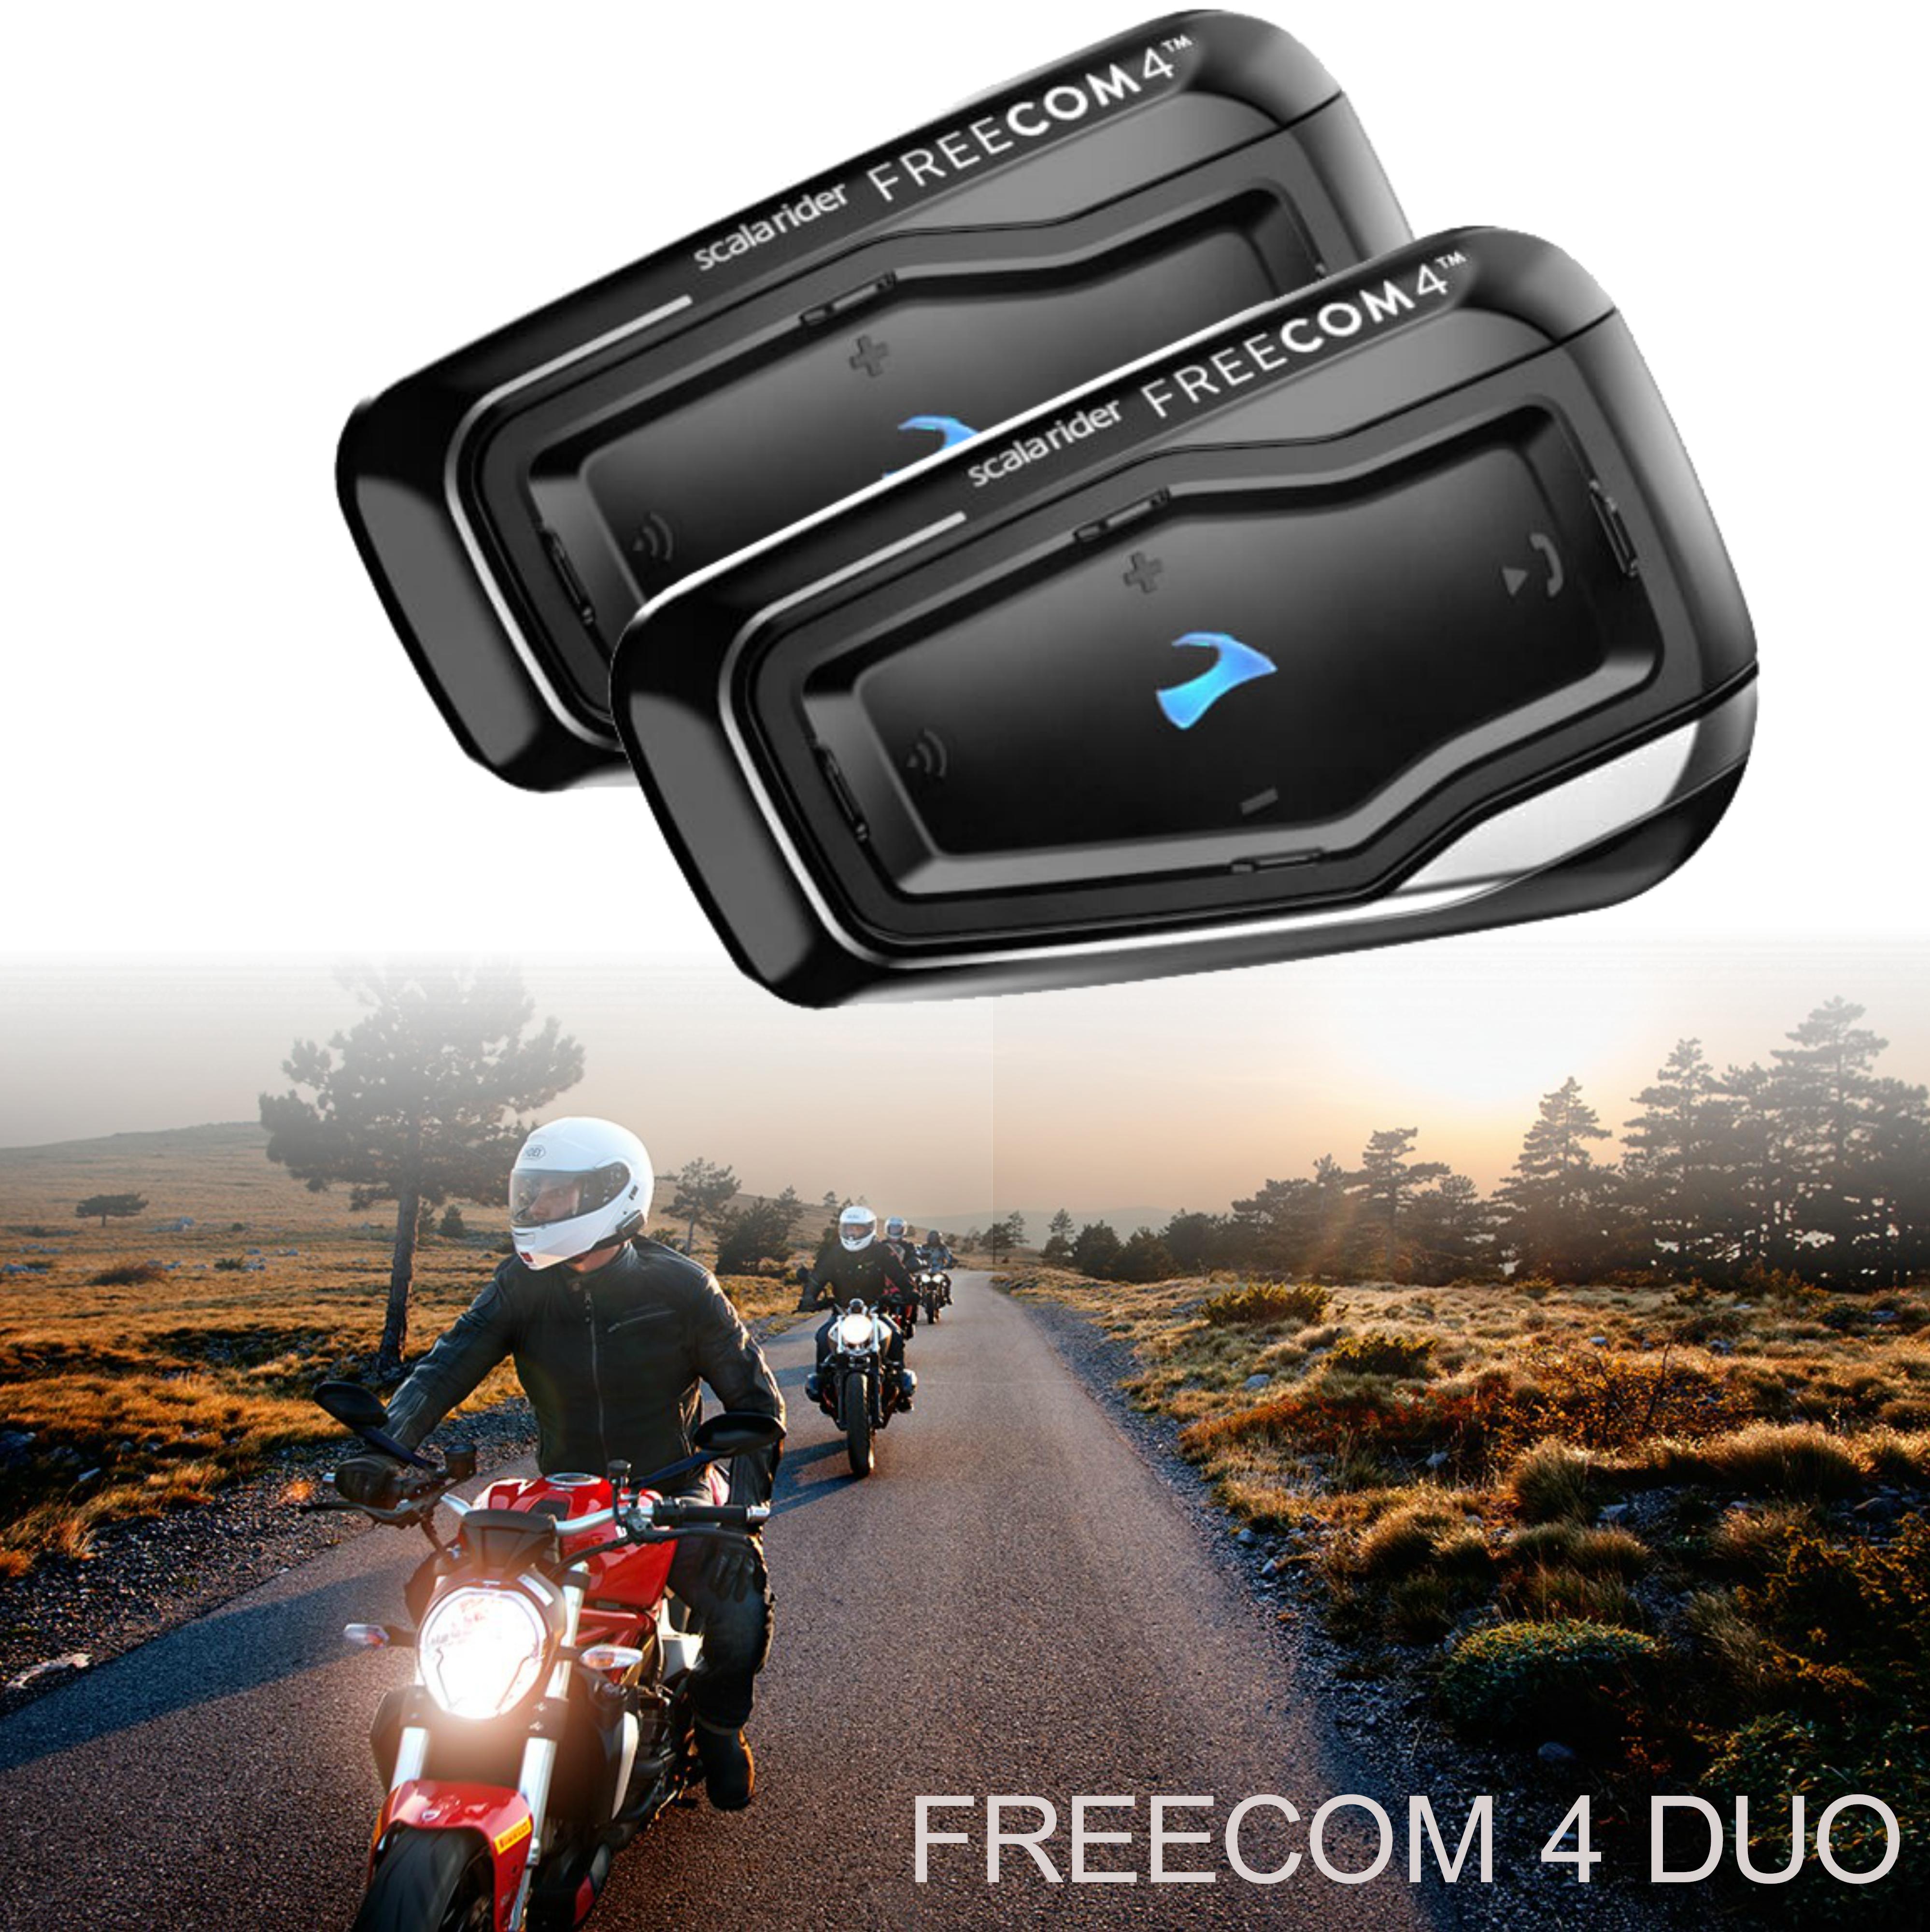 Cardo Scala Freecom 4 Duo?4Way Bike-Bike/Motorcycle Bluetooth 2 Headset/Intercom